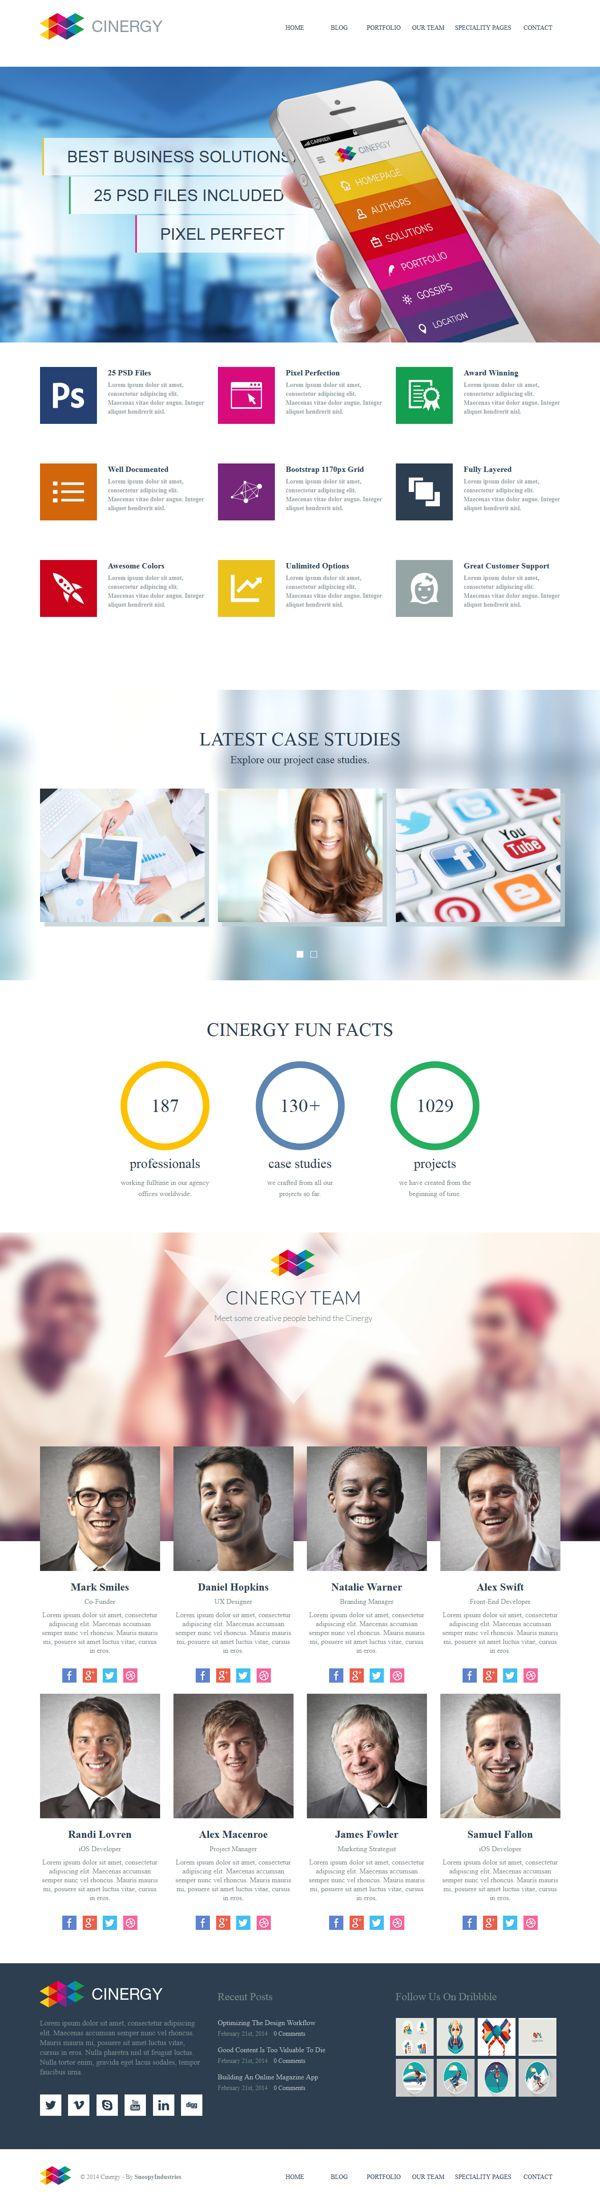 Cinergy - Modern Business Wordpress Theme by mona lisa, via Behance